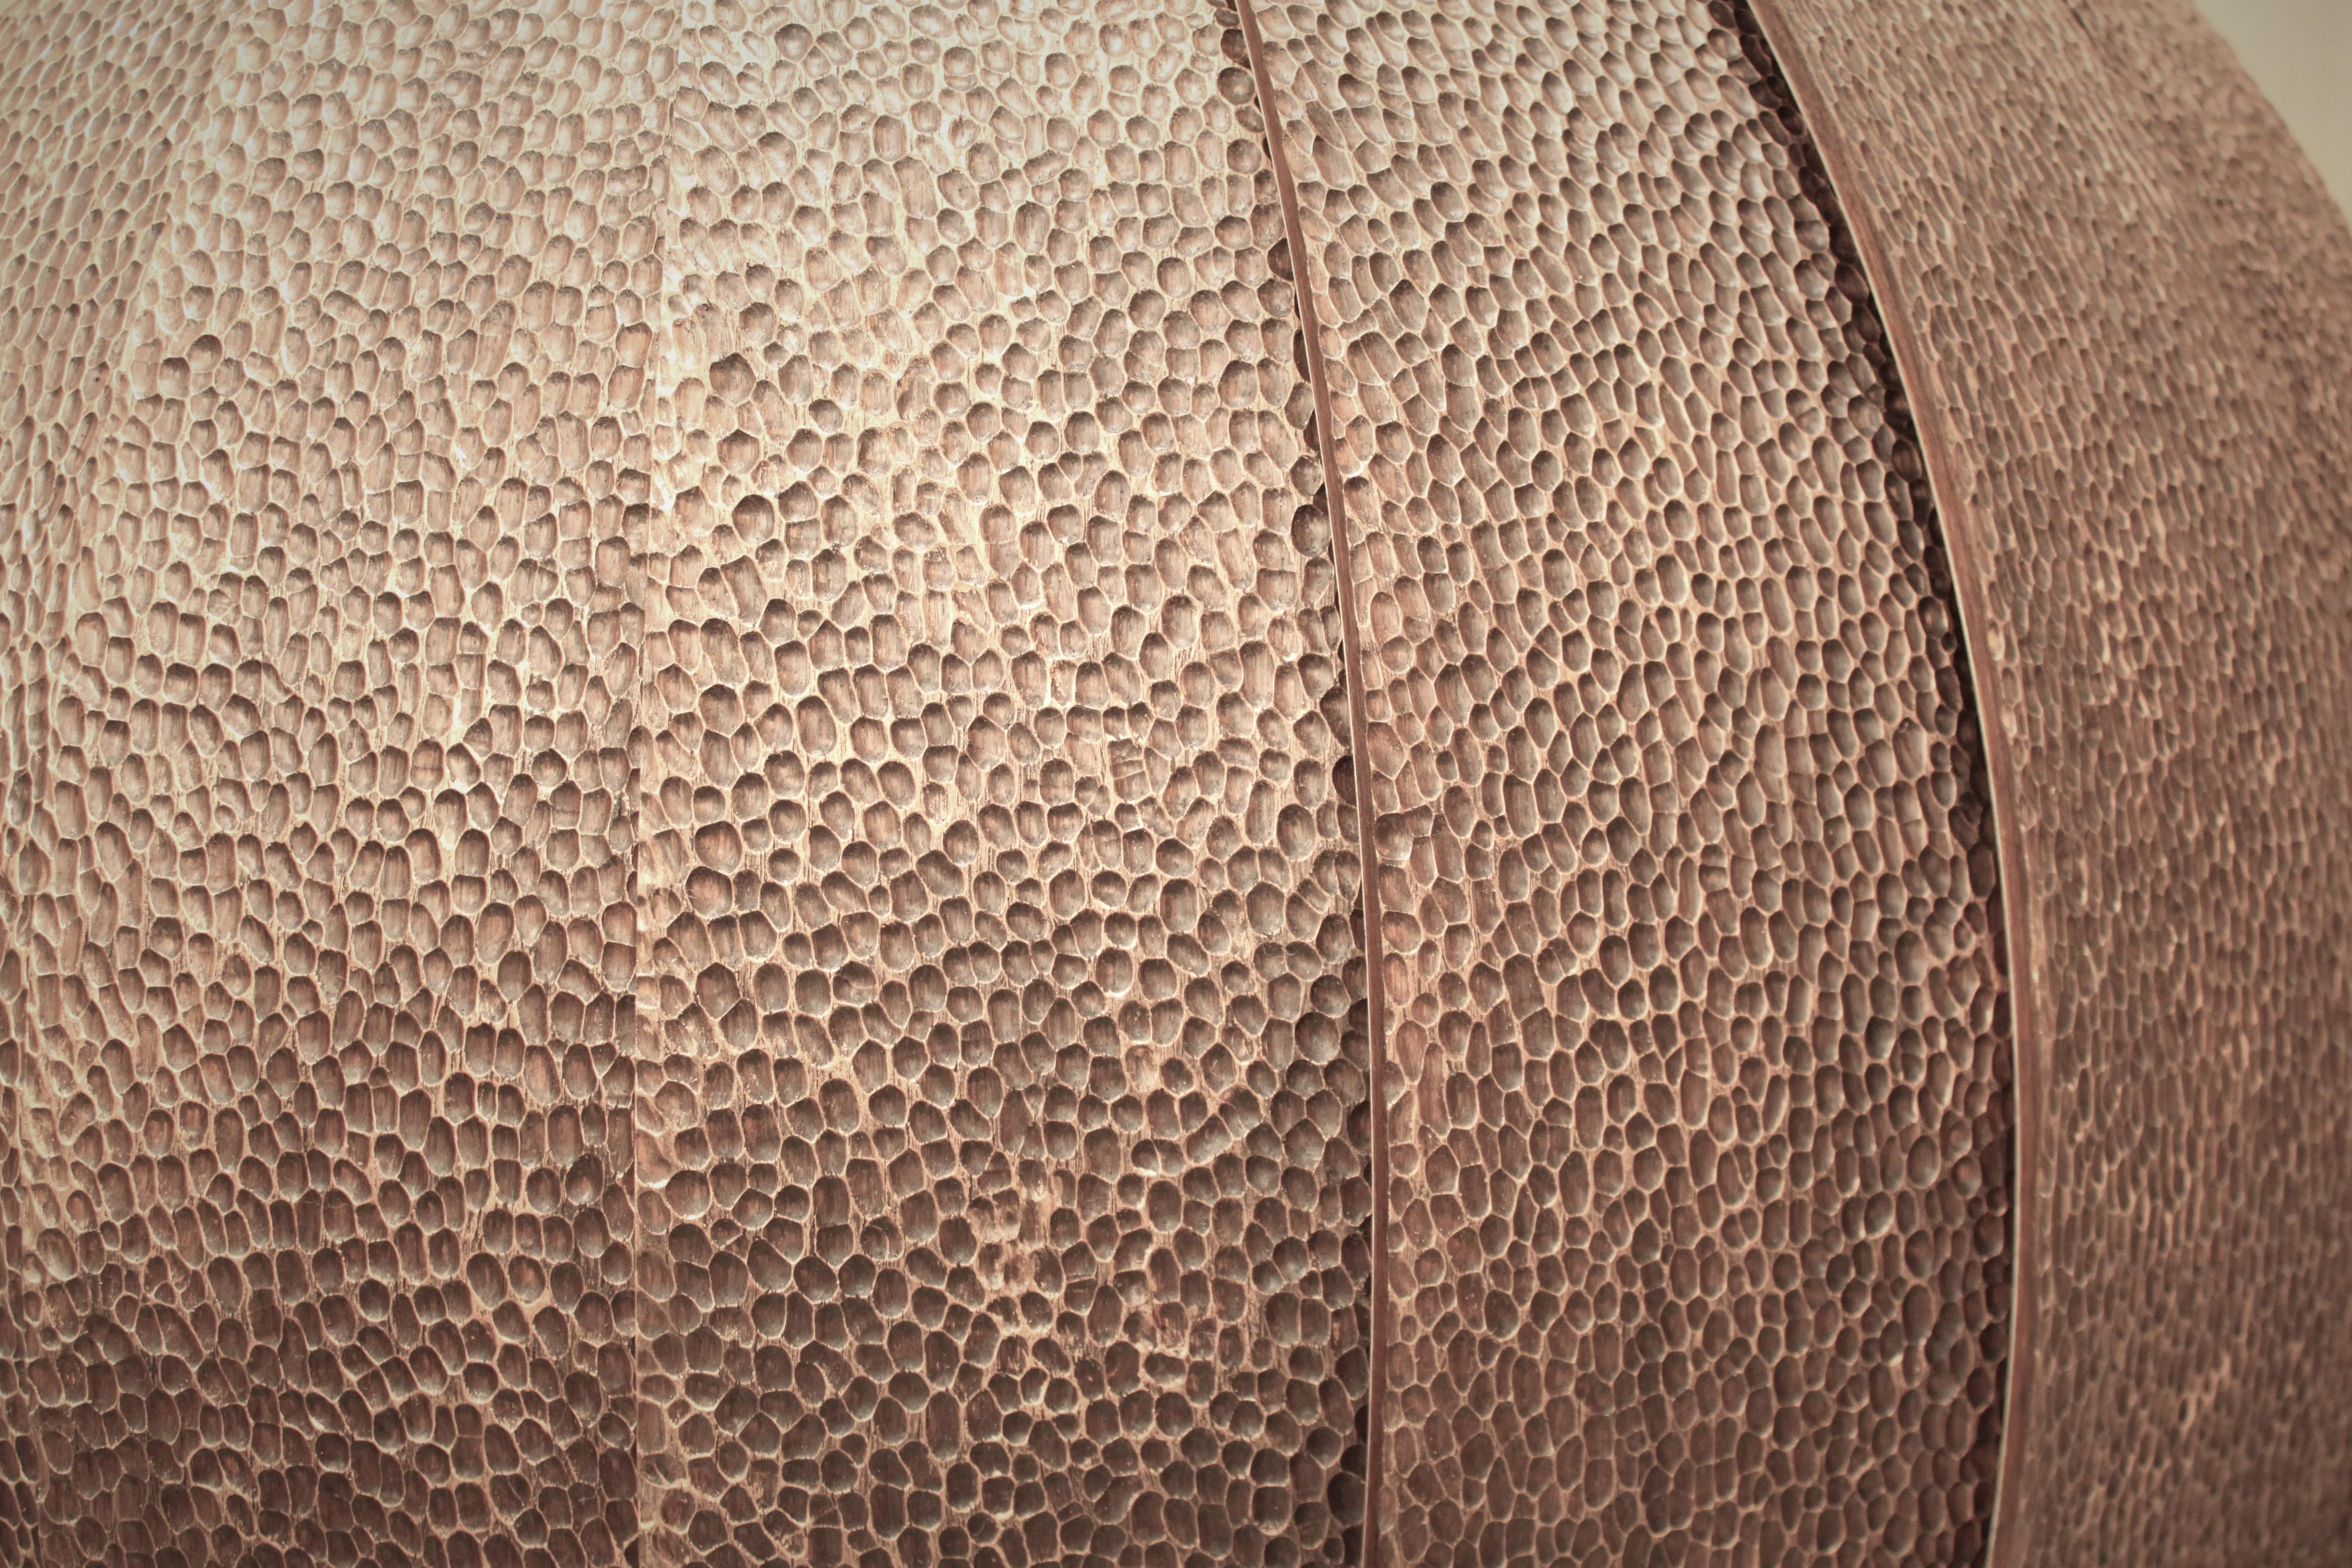 Detail of tooled walnut veneer on custom wall-mounted desk by Splinterworks.